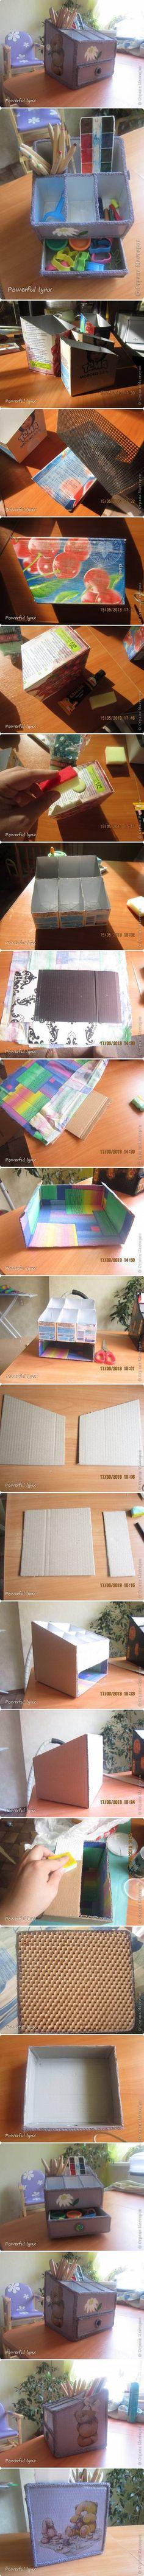 DIY Beautiful Desk Organizer